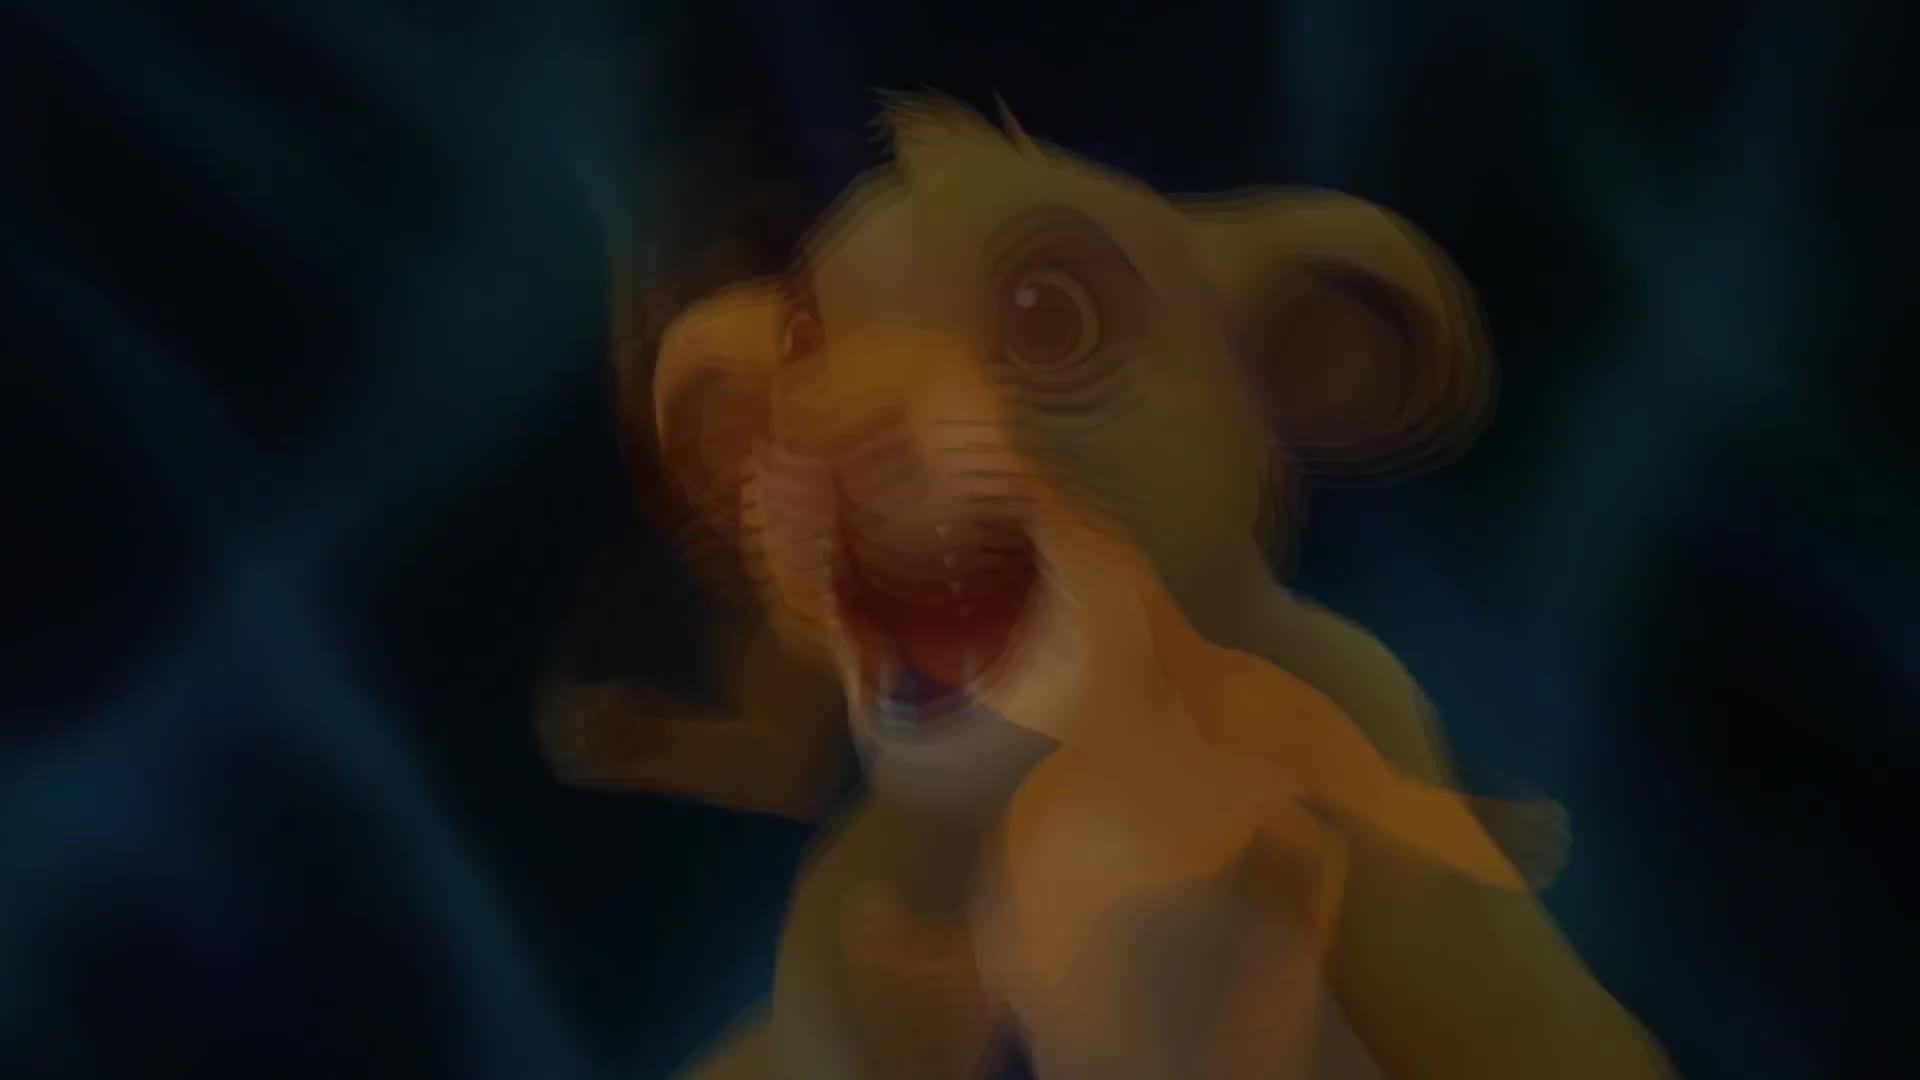 Kingdom Hearts 2 Hd Final Mix Movie 60fps 1080p Gif Lion King